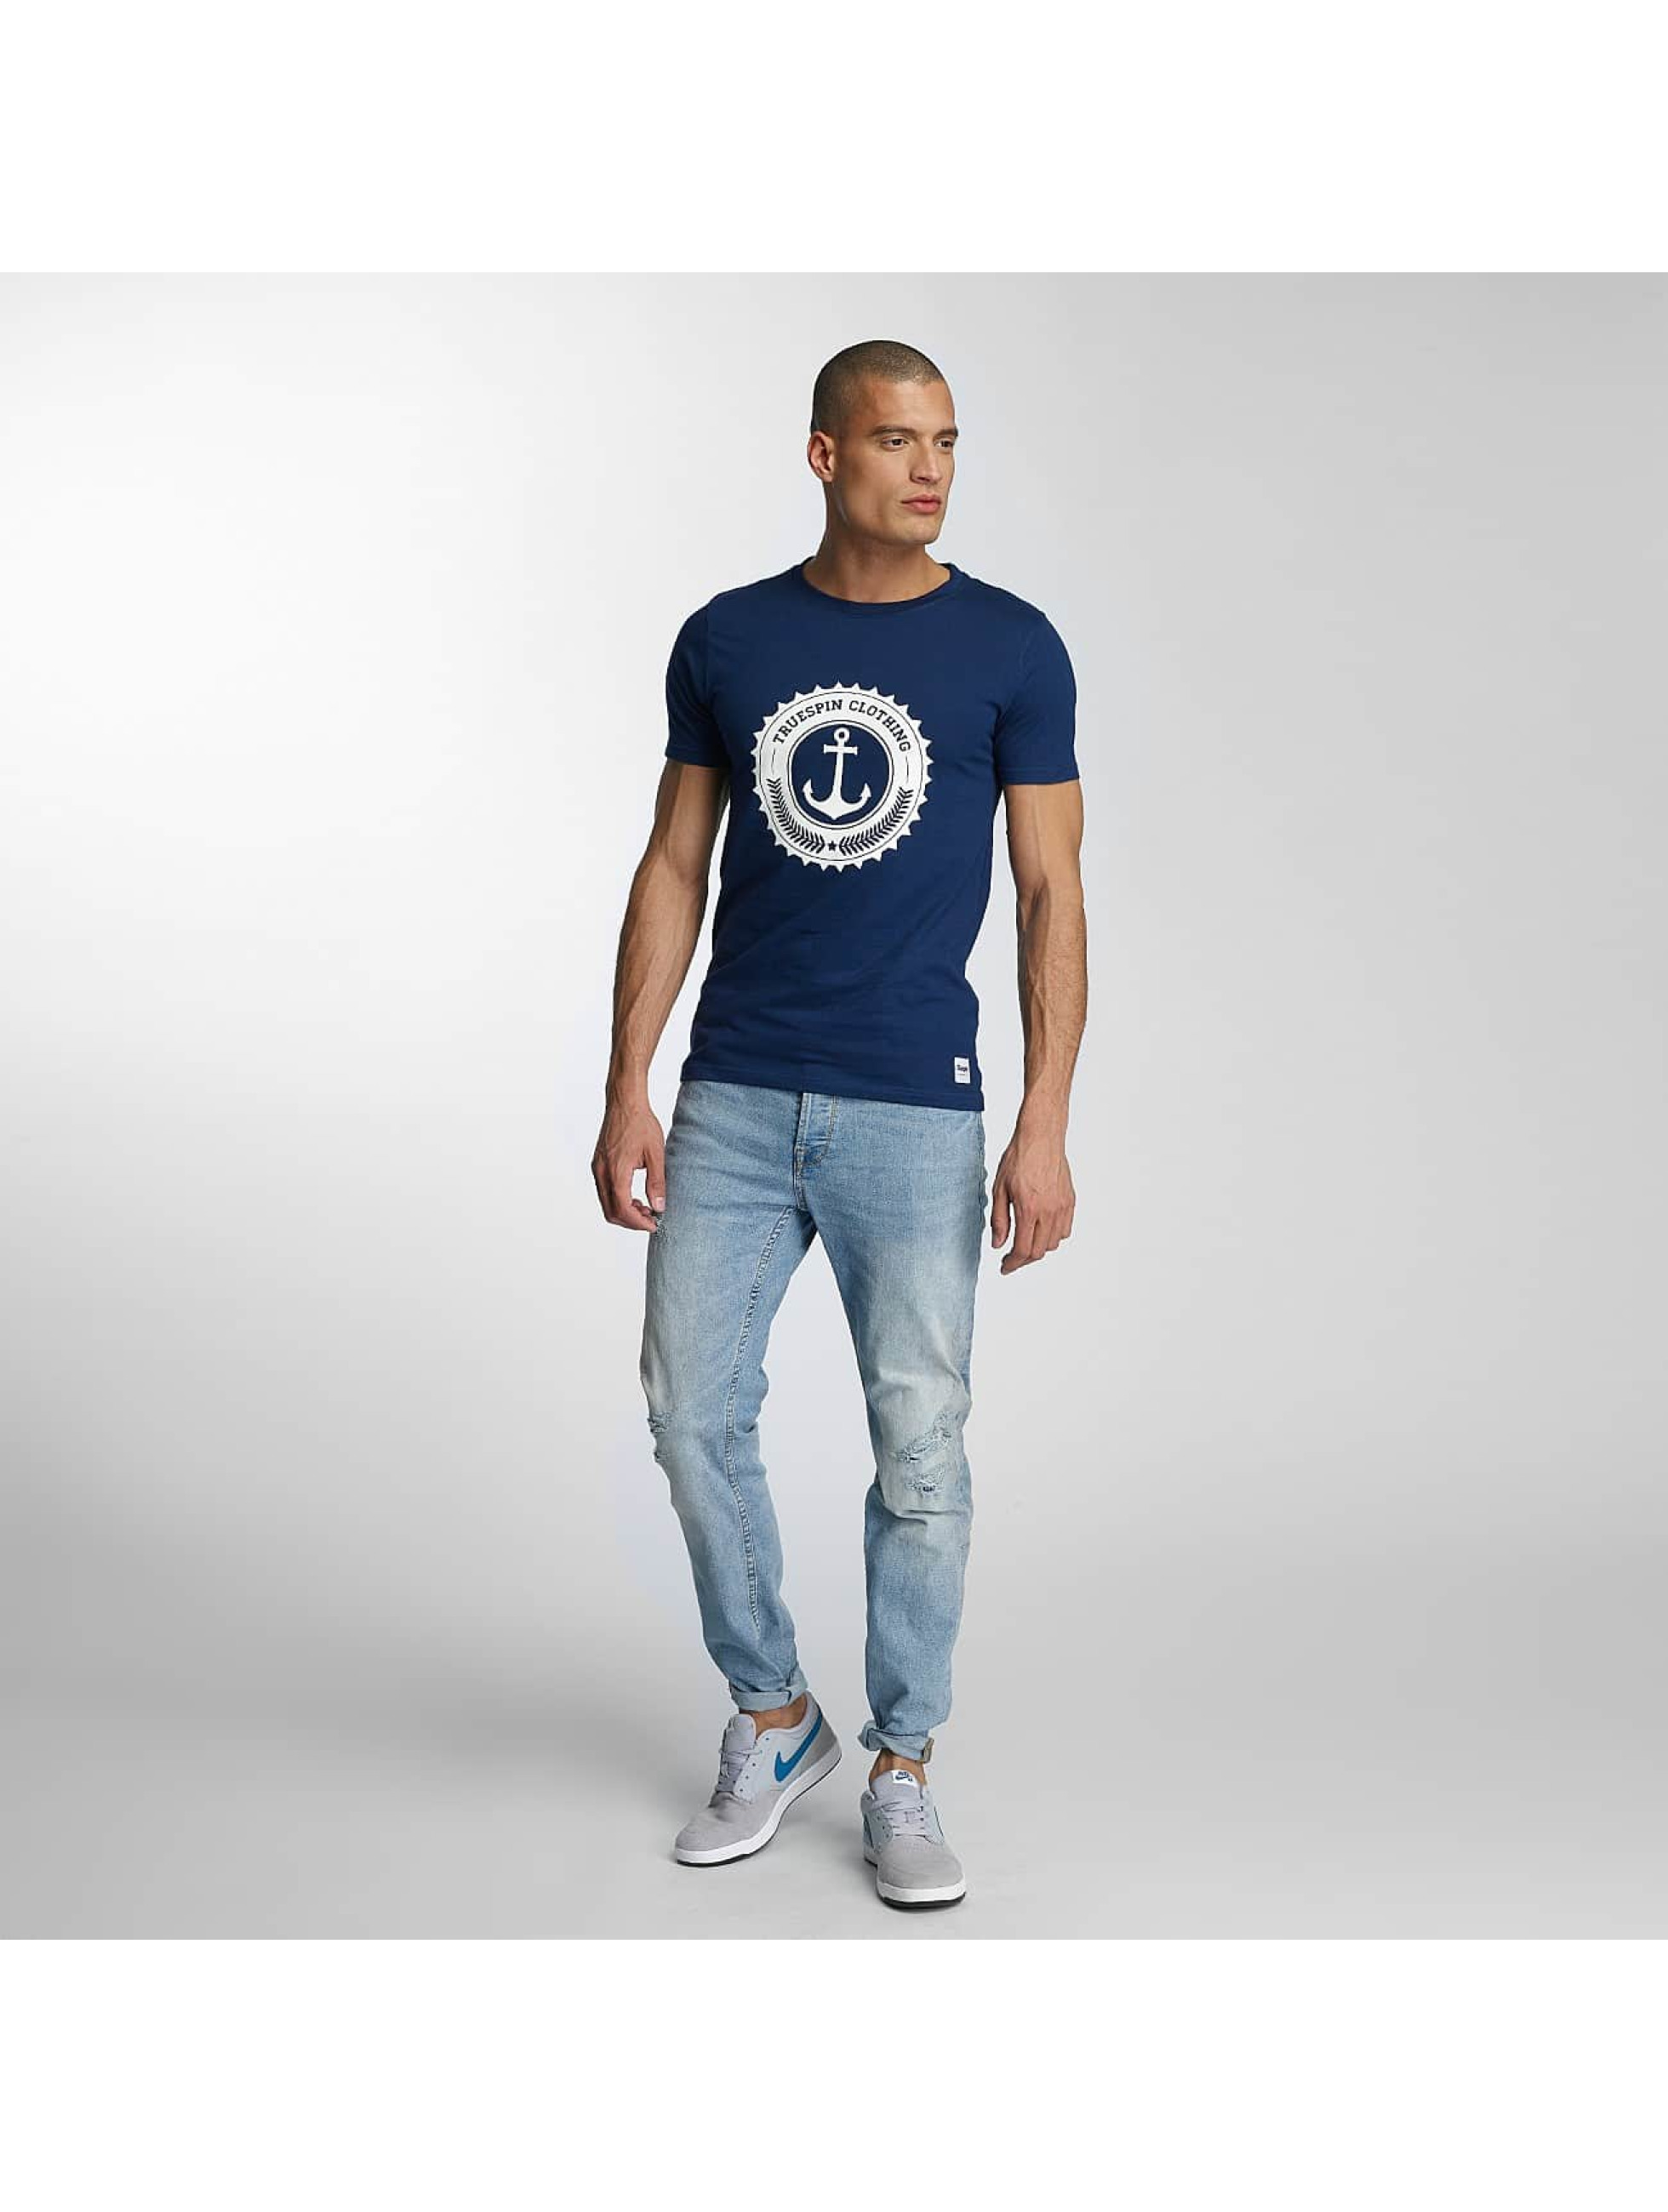 TrueSpin T-Shirt 2 blue